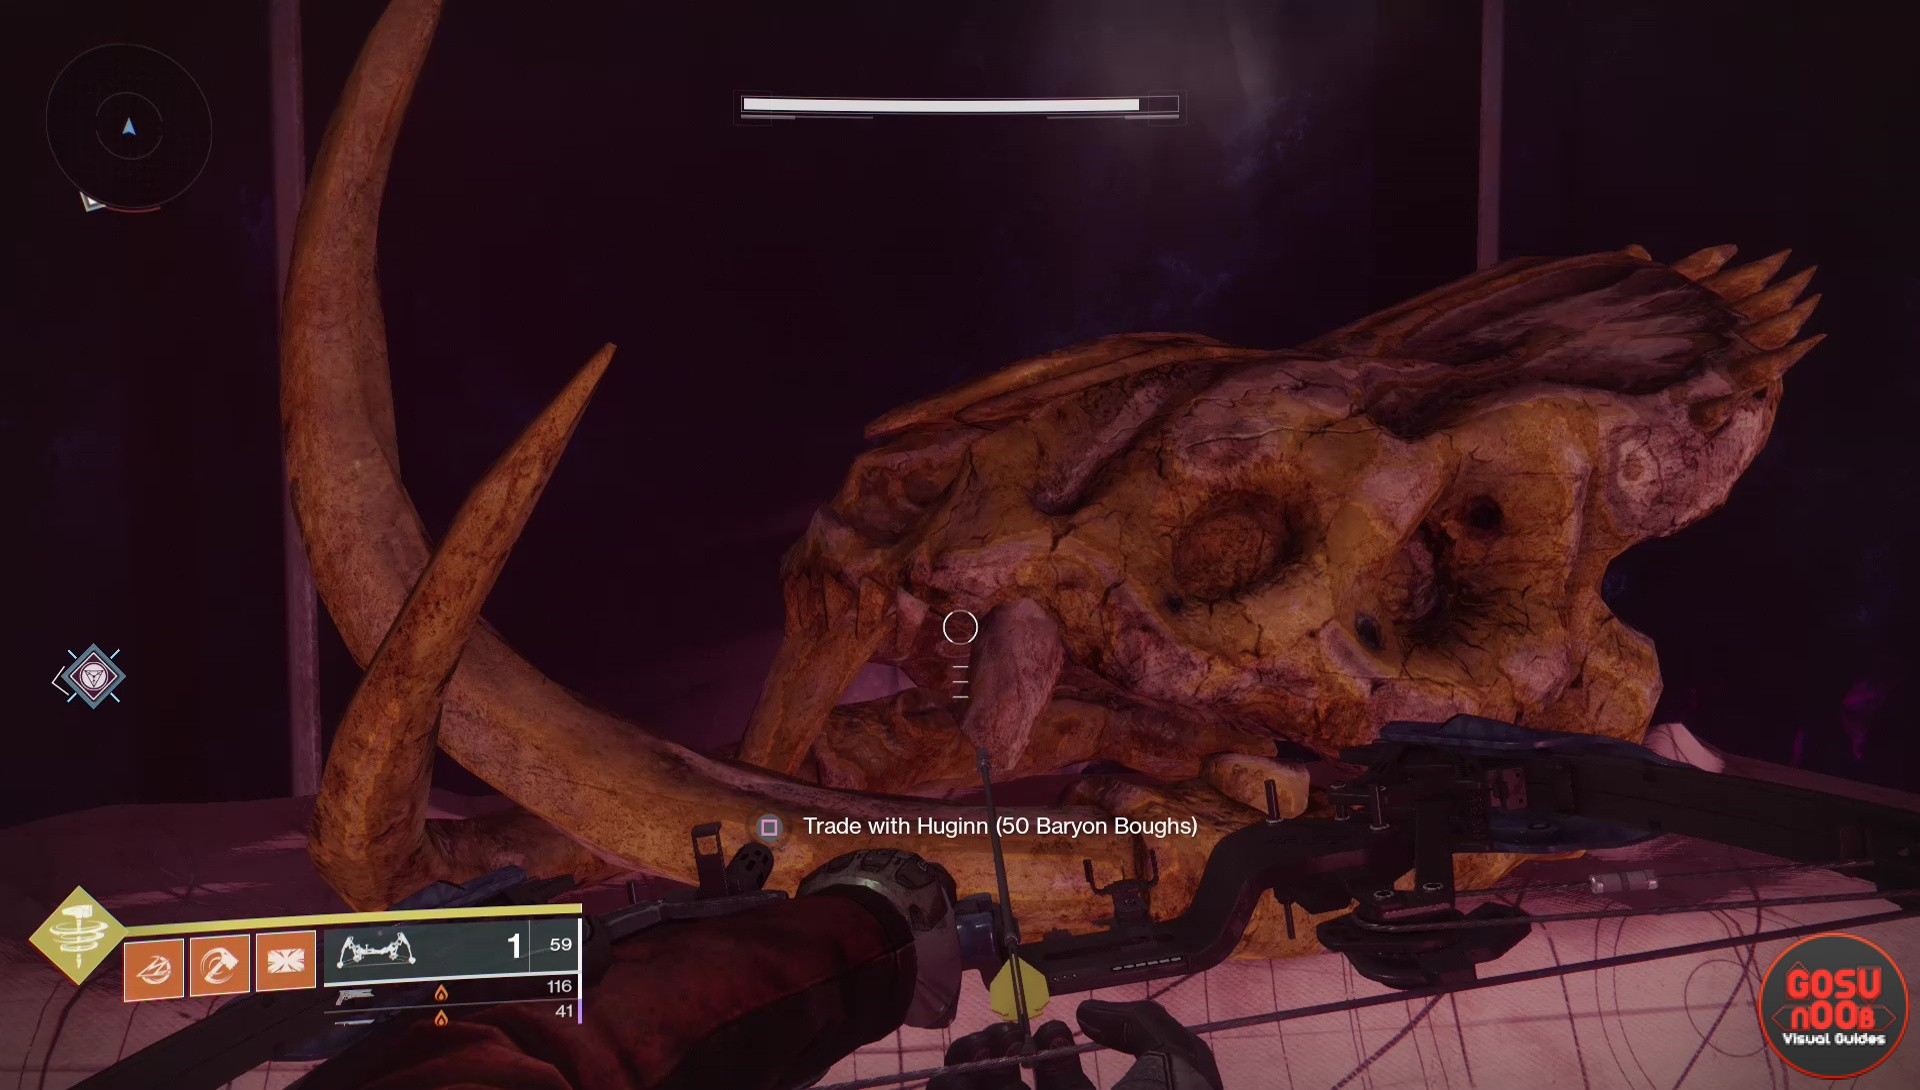 Destiny 2 Where to Buy Tincture of Queensfoil in Forsaken